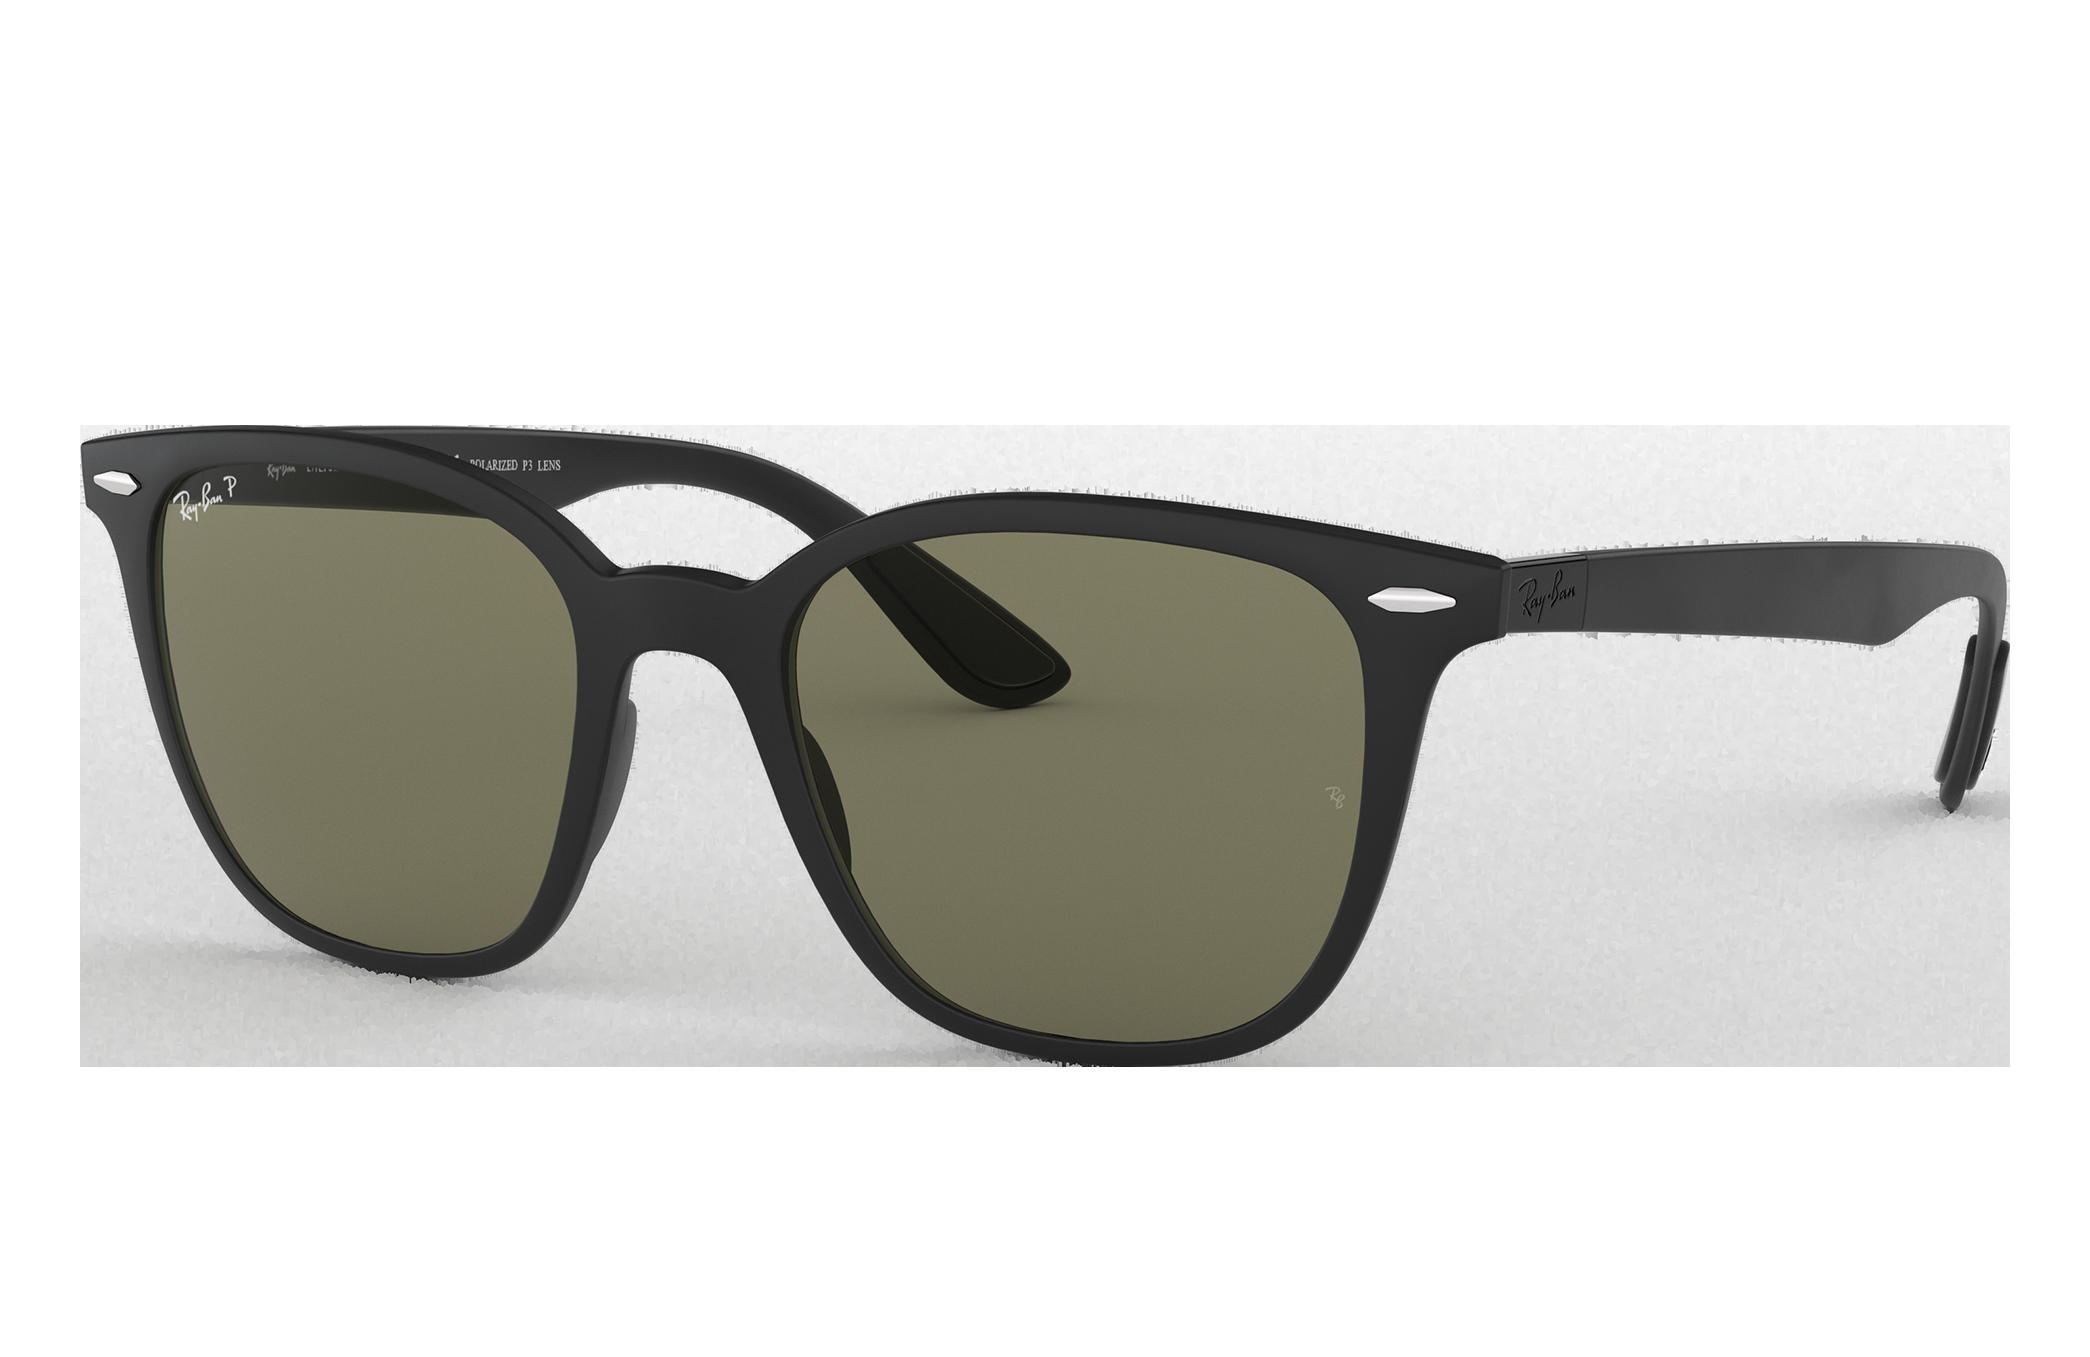 Ray-Ban Rb4297 Black, Polarized Green Lenses - RB4297